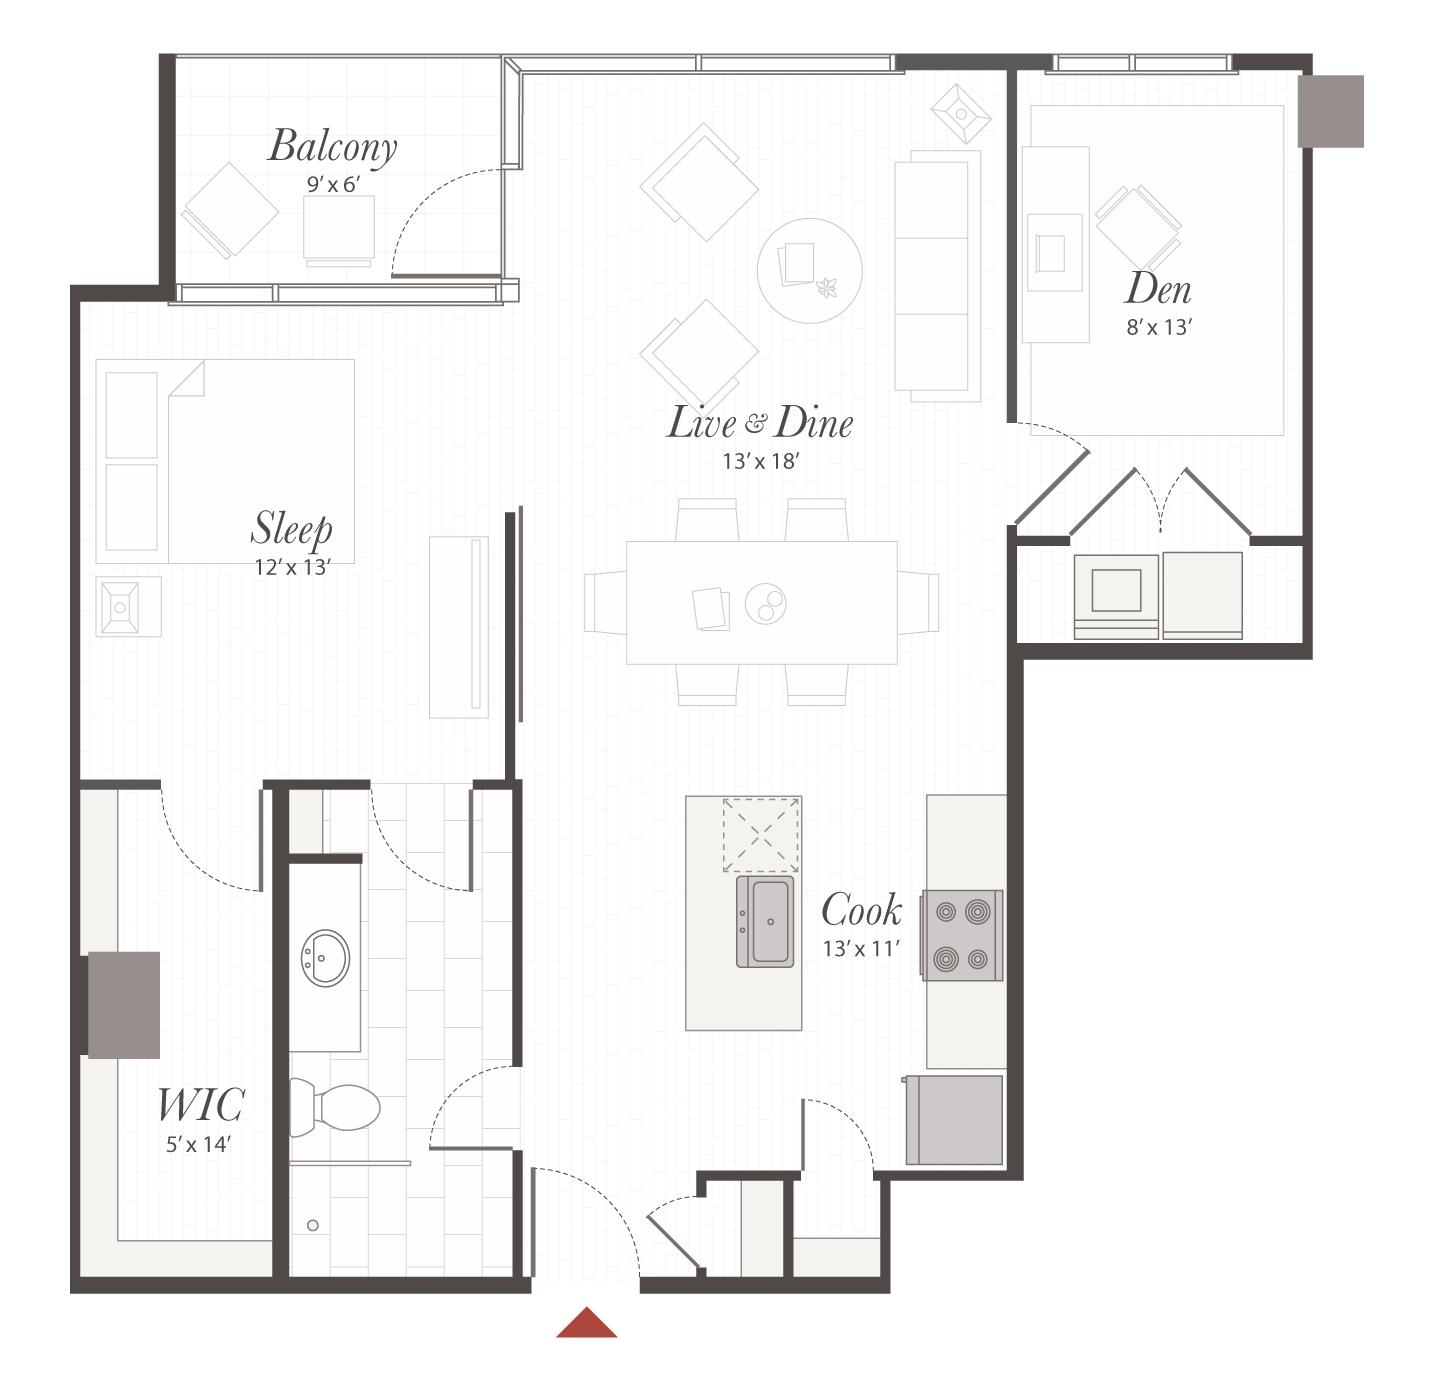 B5 - 1 Bedroom Apartment Cincinnati | Encore Apartments